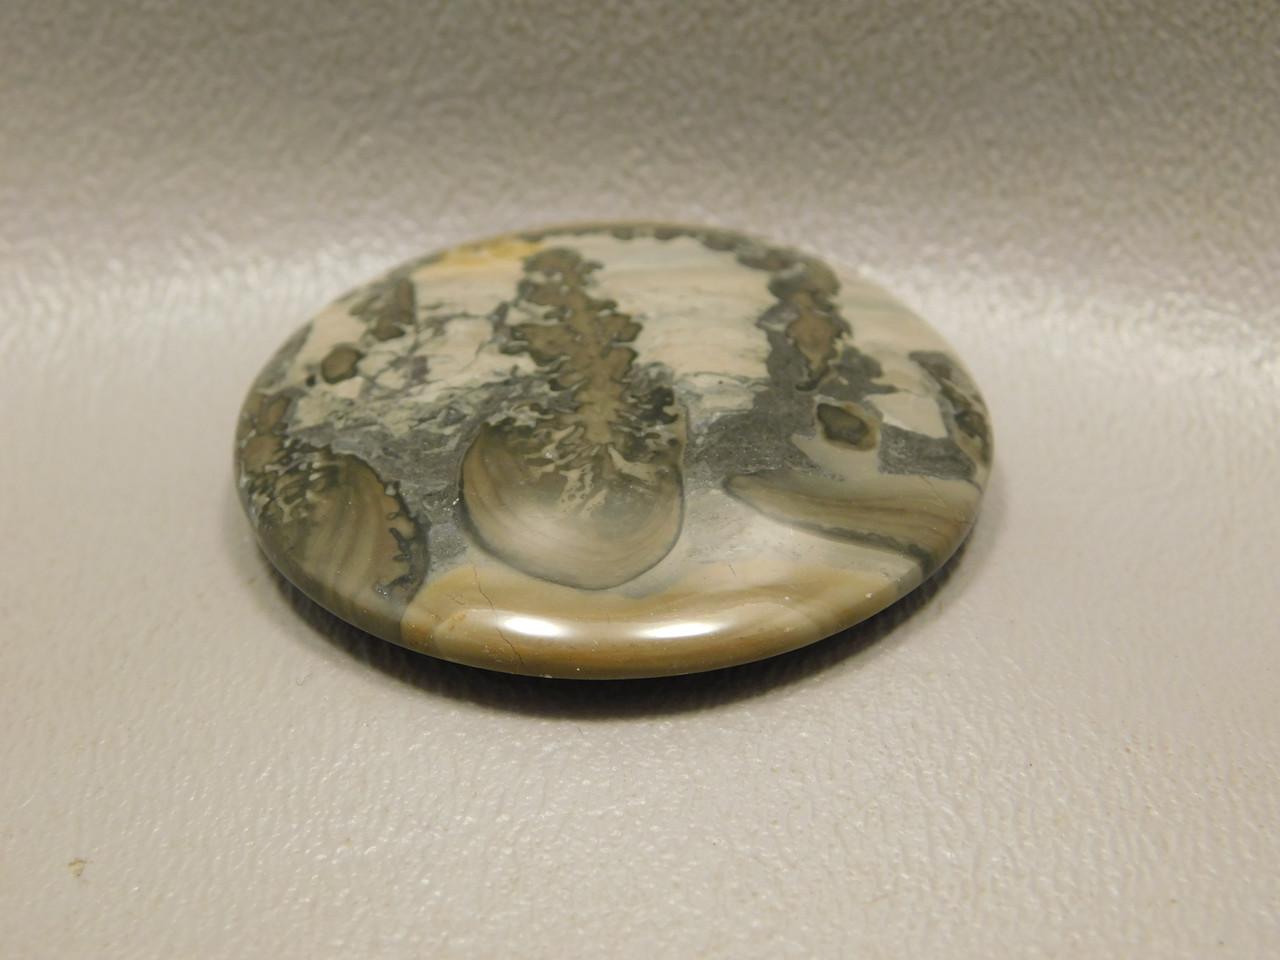 Cotham Marble Fossil Stromatolite Stone Cabochon Jewelry Supply #18